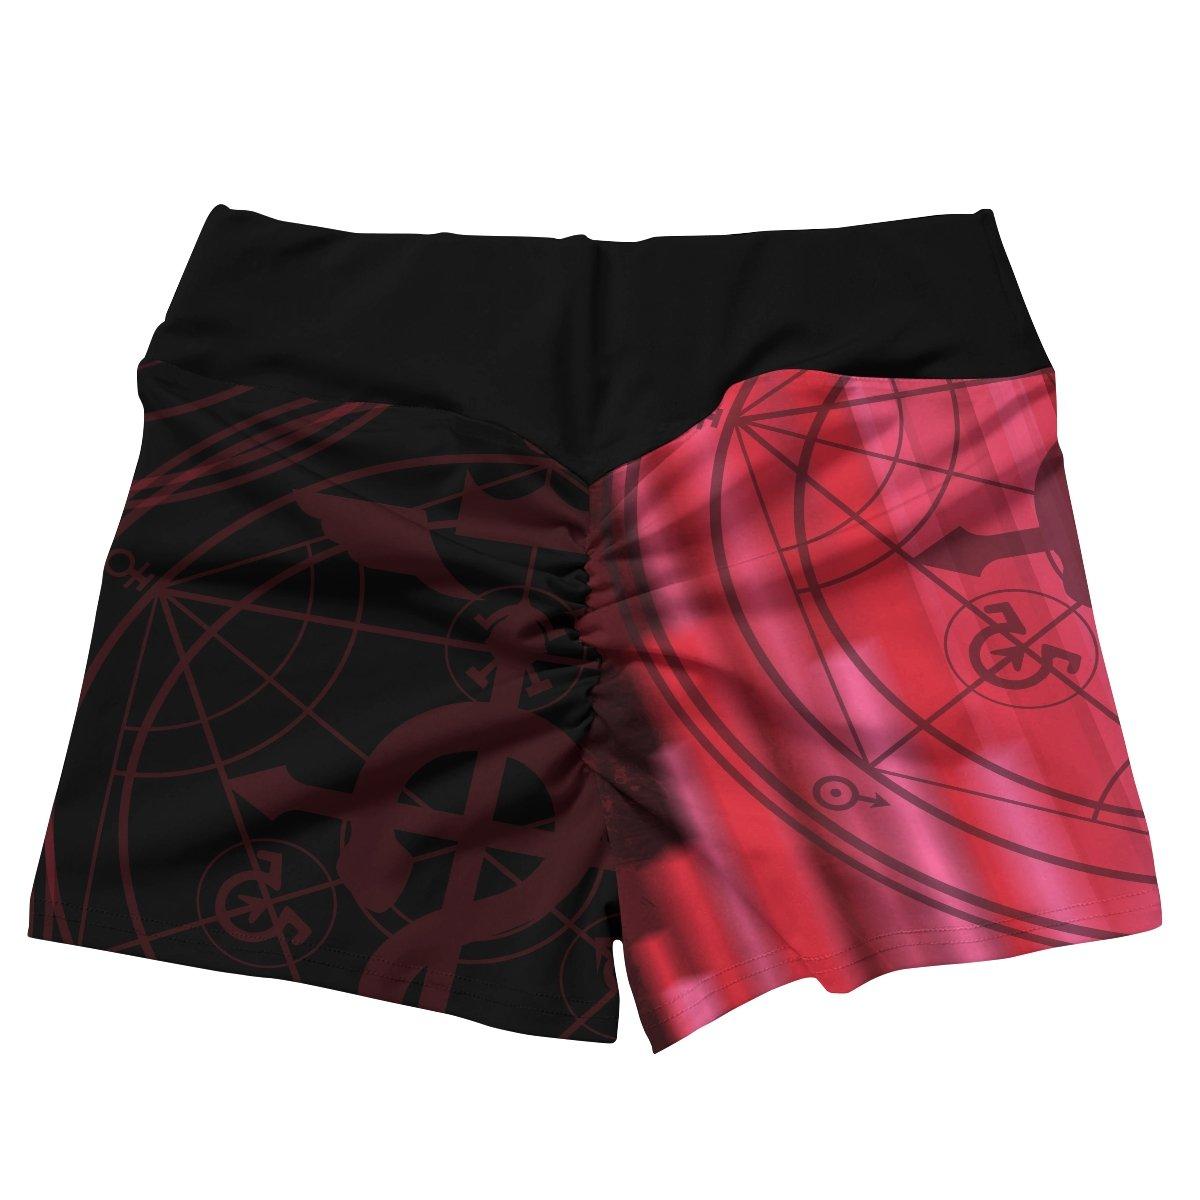 edward summer active wear set 595266 - Anime Swimsuits